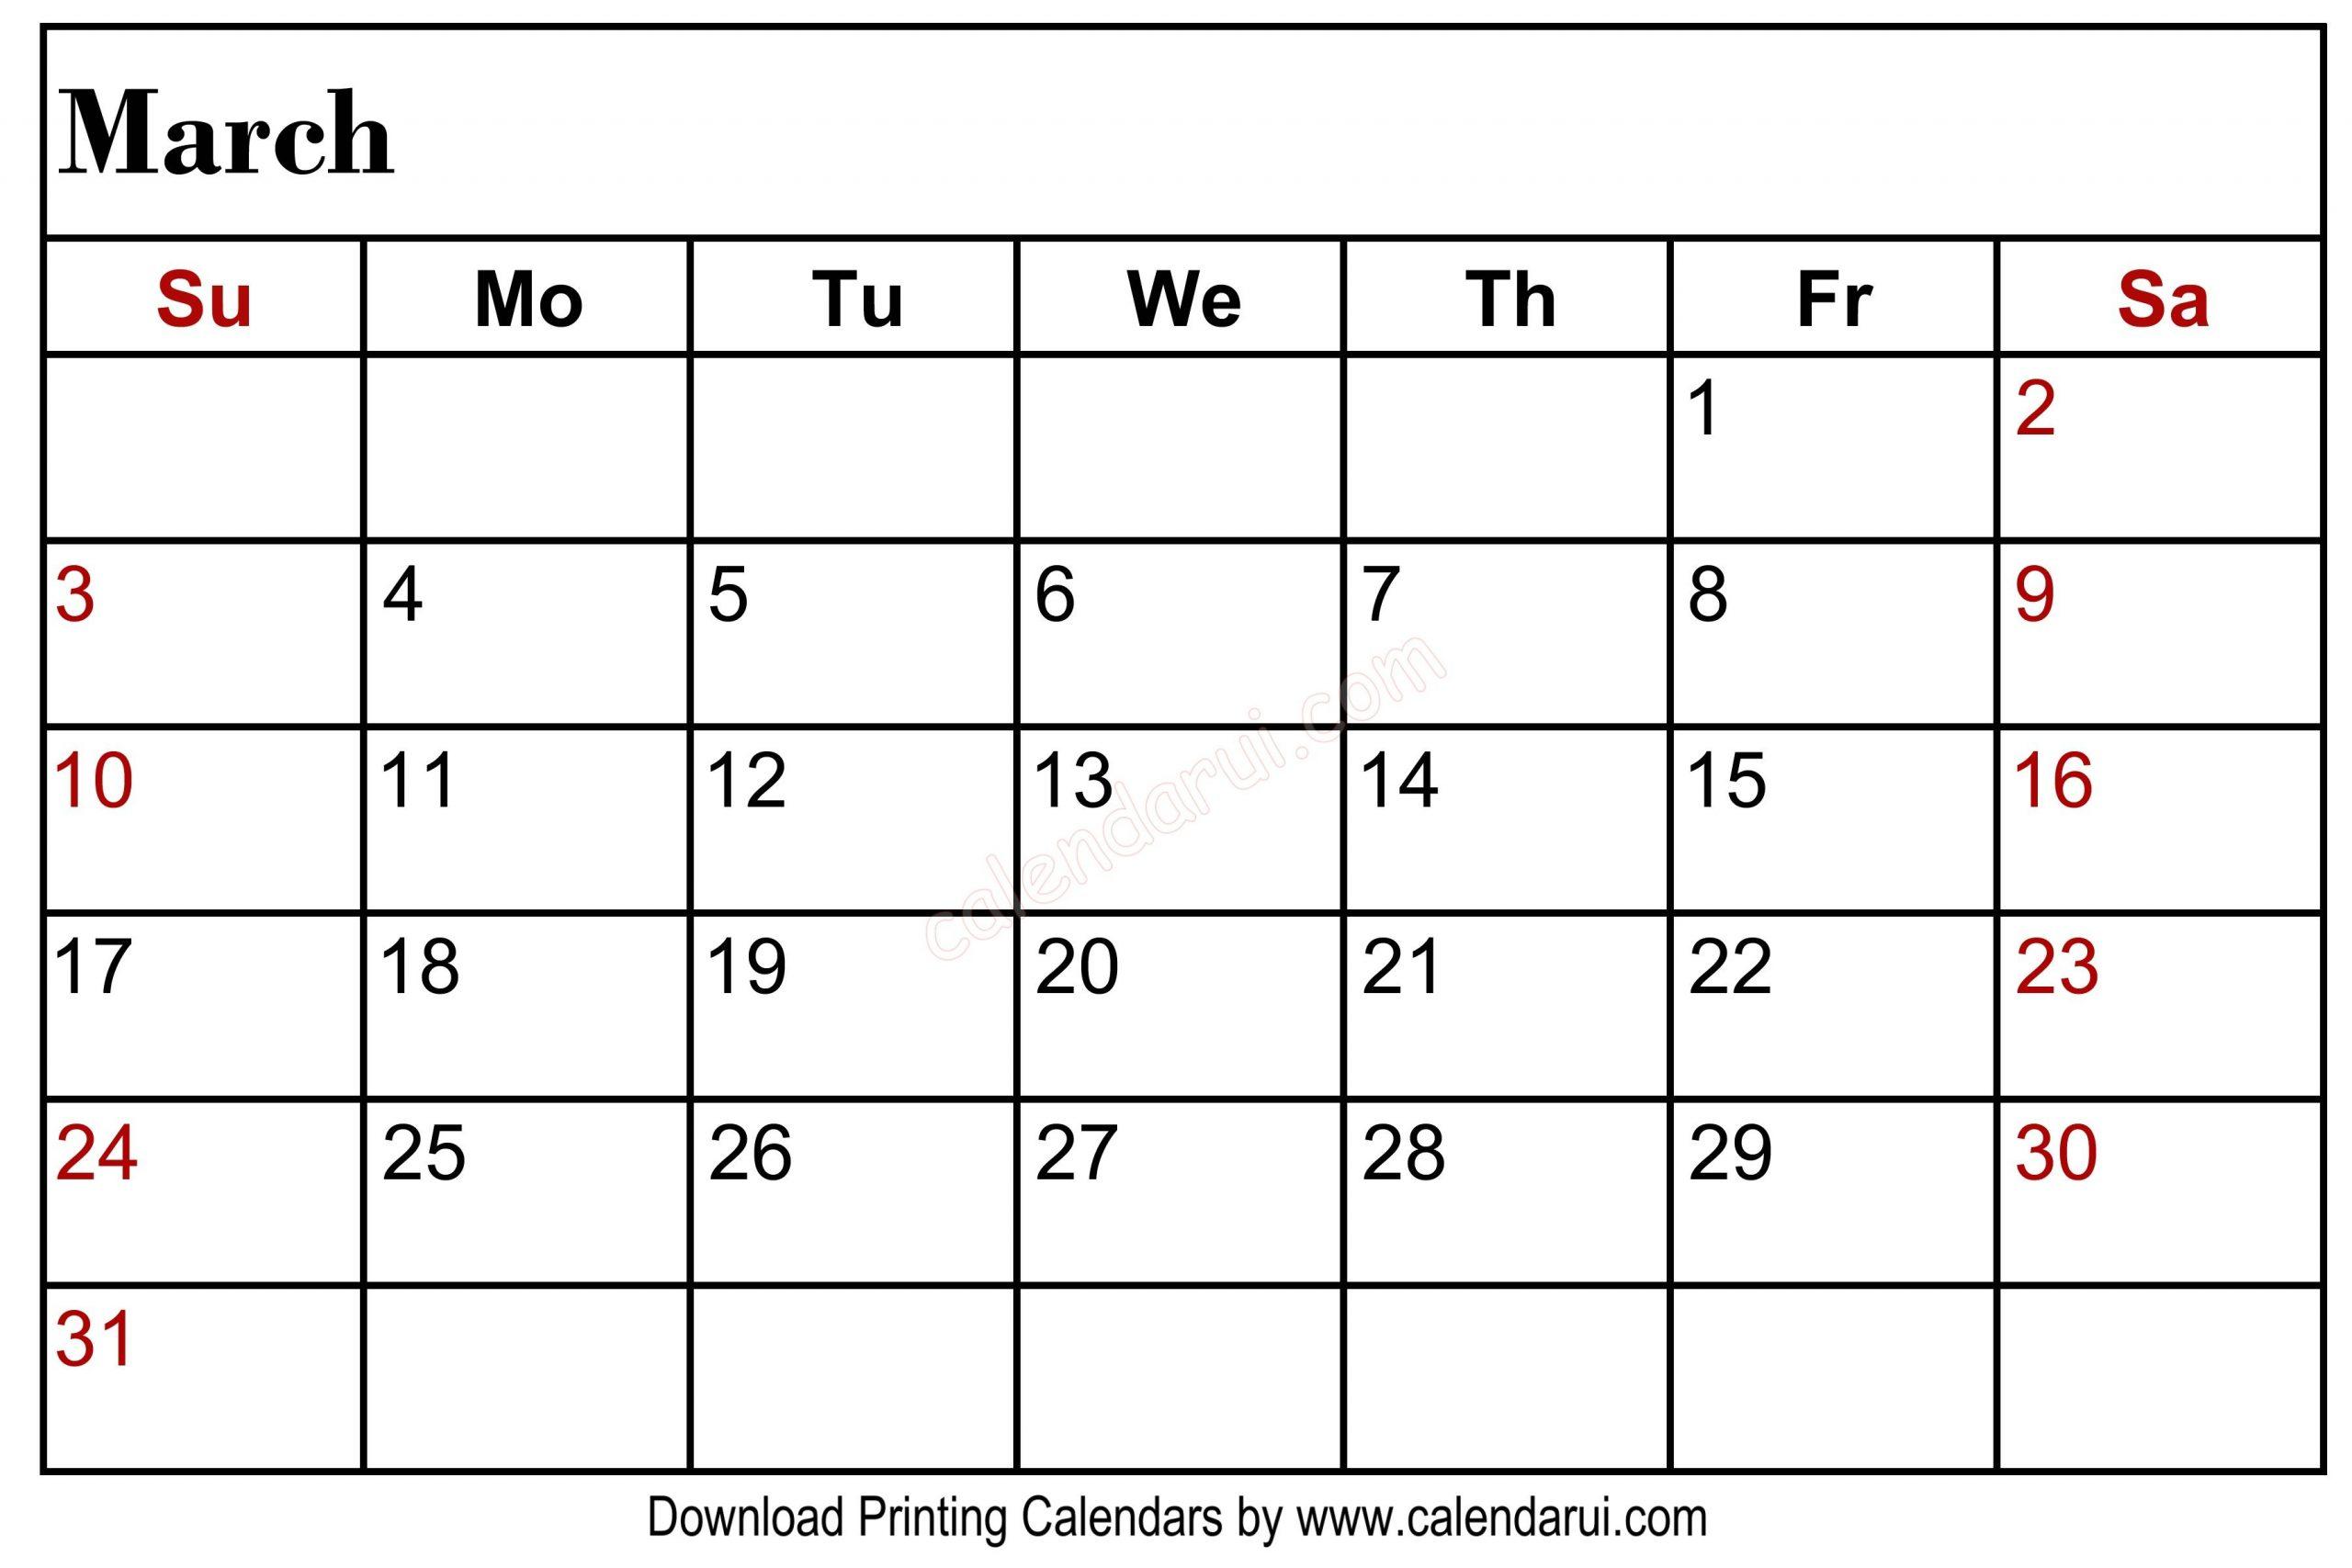 March 2020 Blank Calendar Printable Left Header | Blank